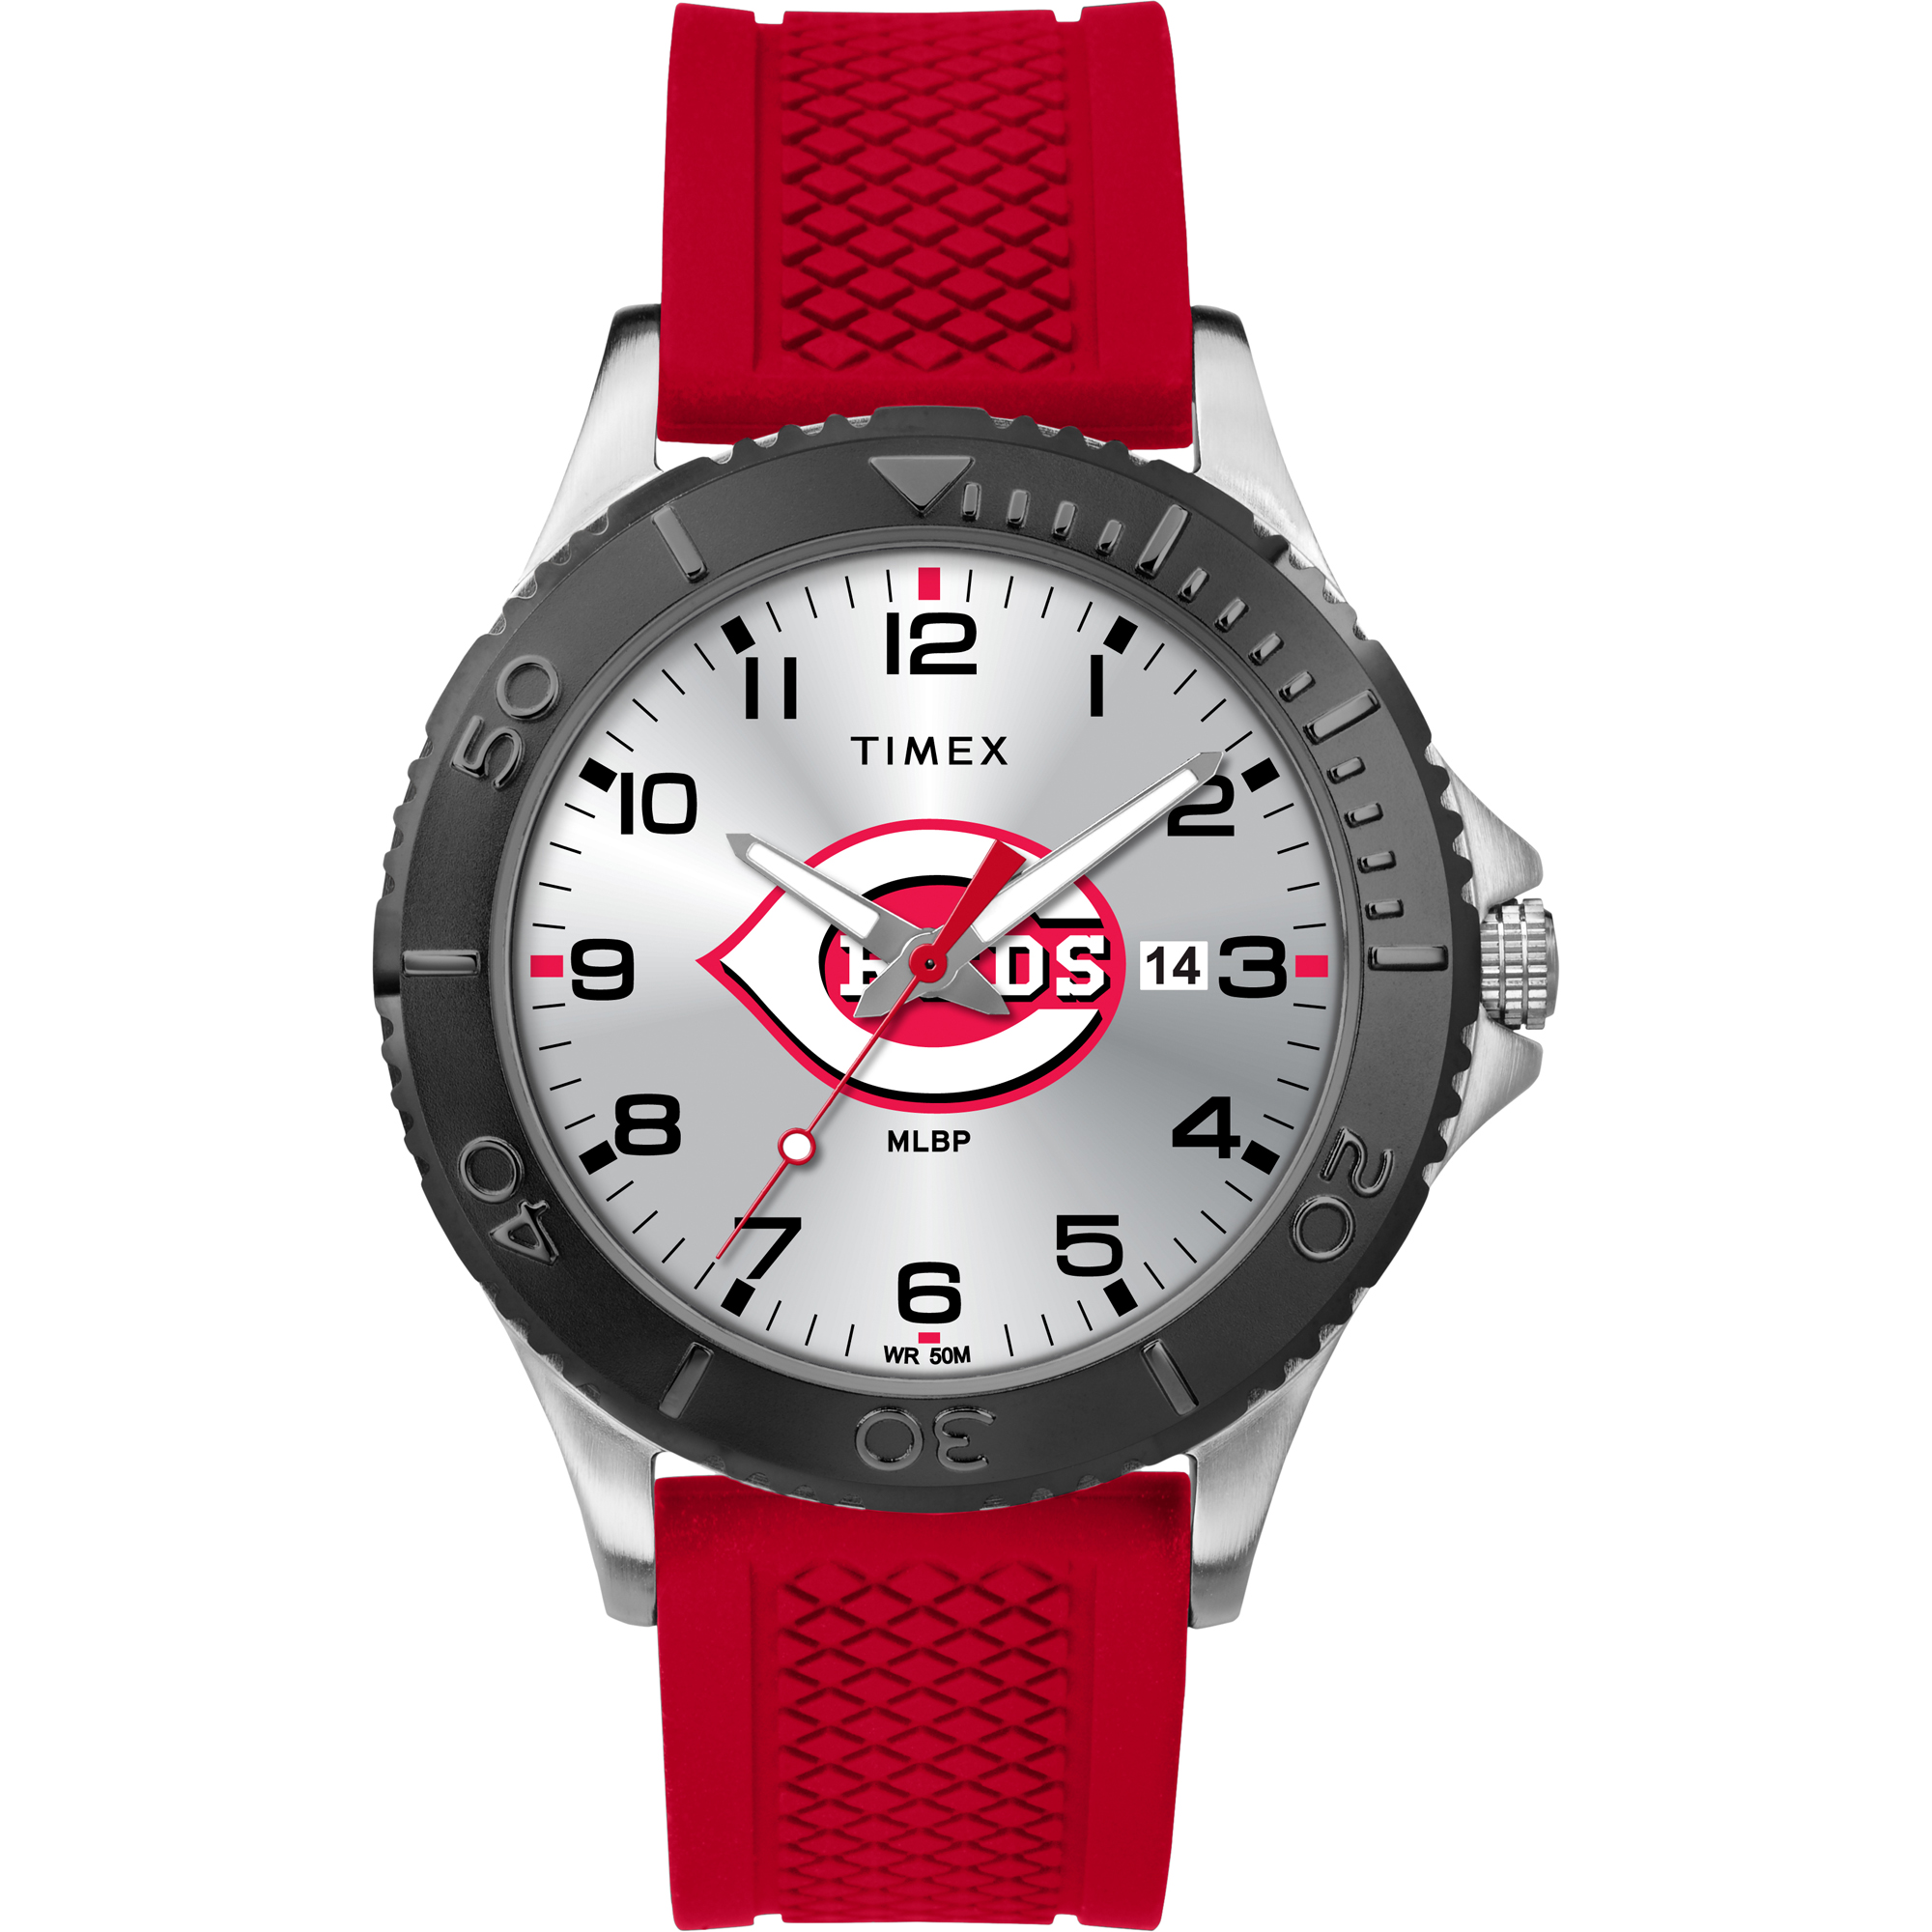 Cincinnati Reds Timex Gamer Watch - No Size